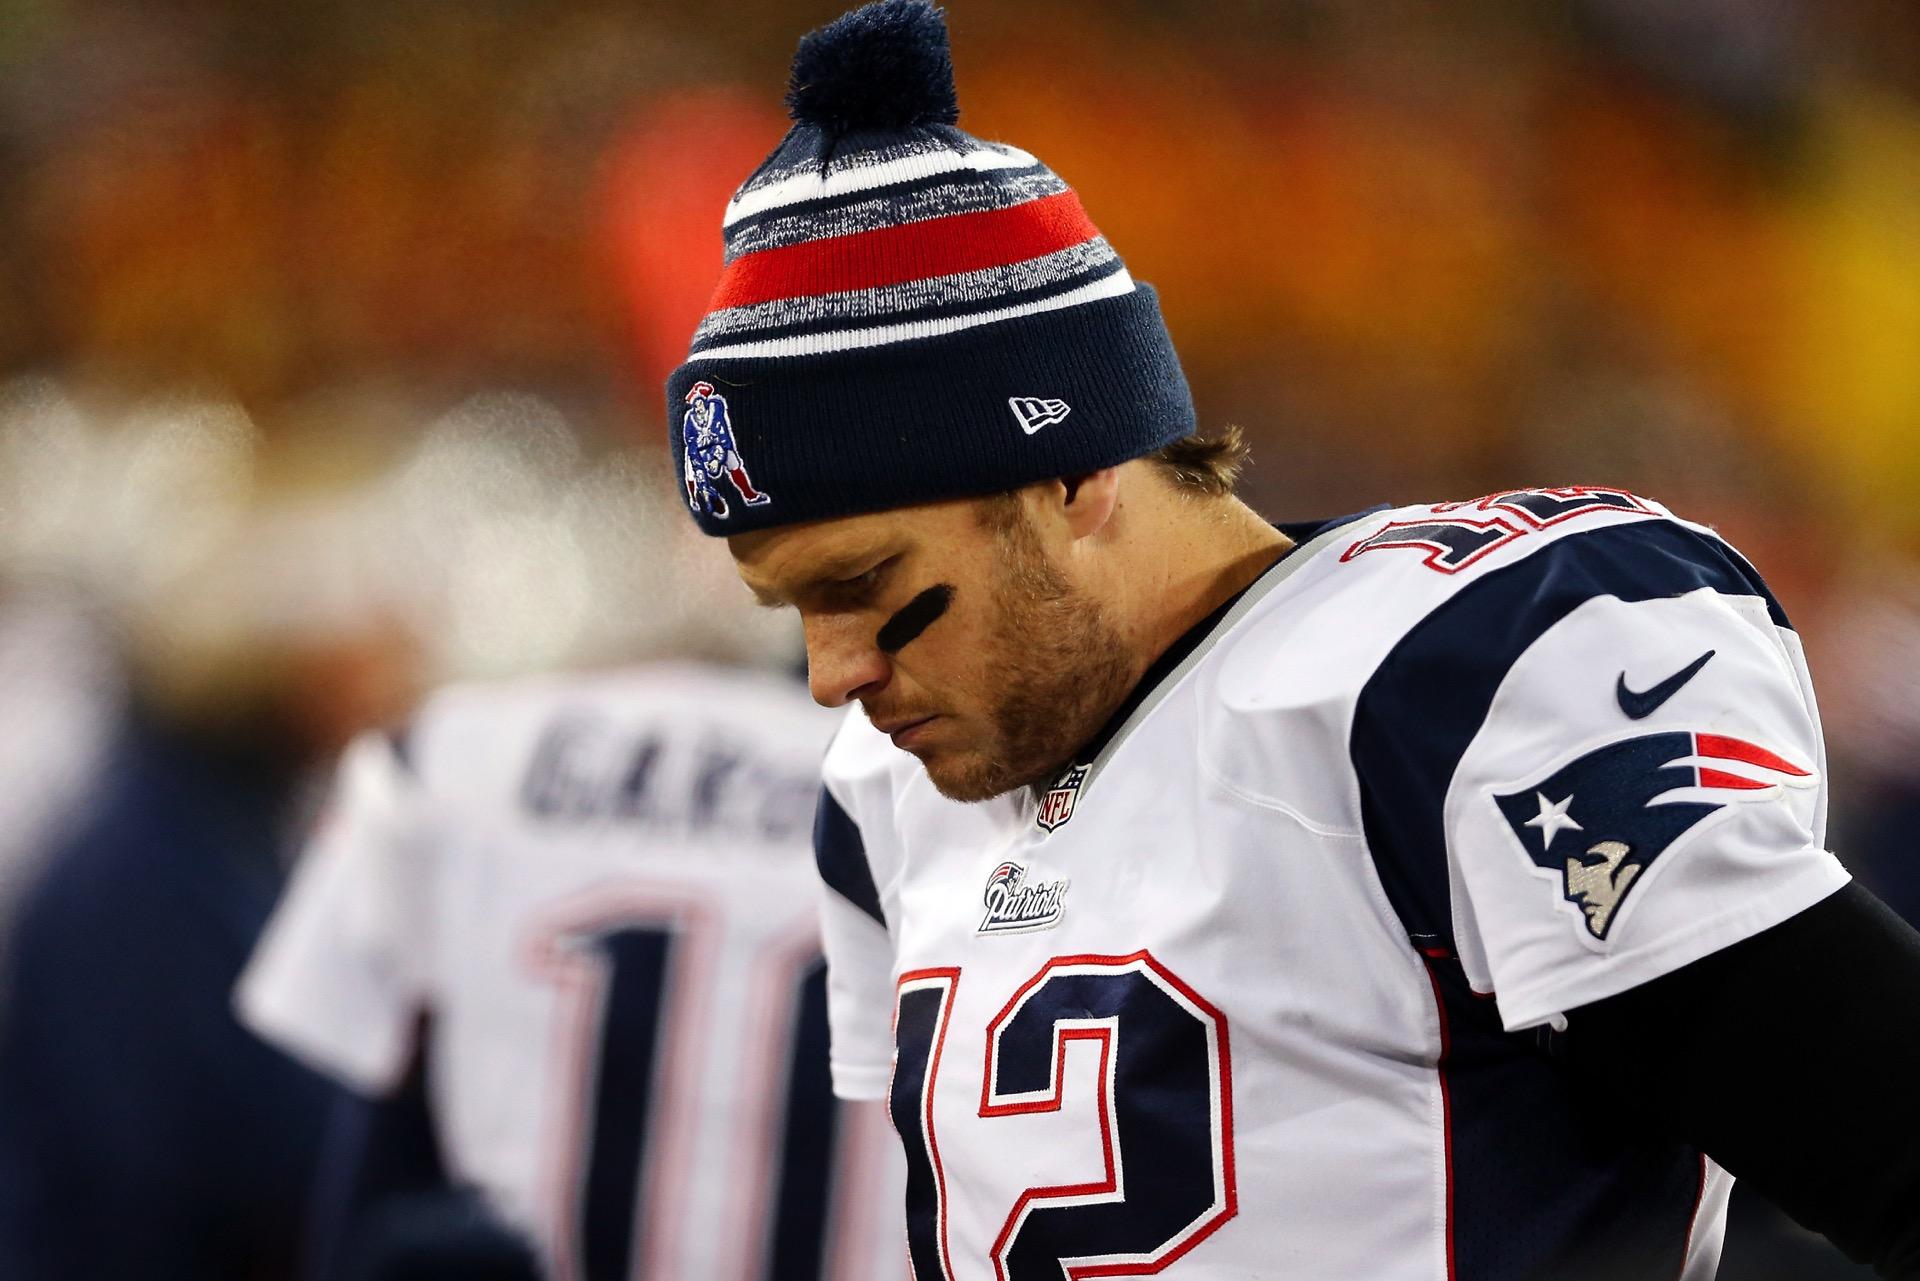 Minnesota judge transfers NFLPA's Tom Brady case to Manhattan